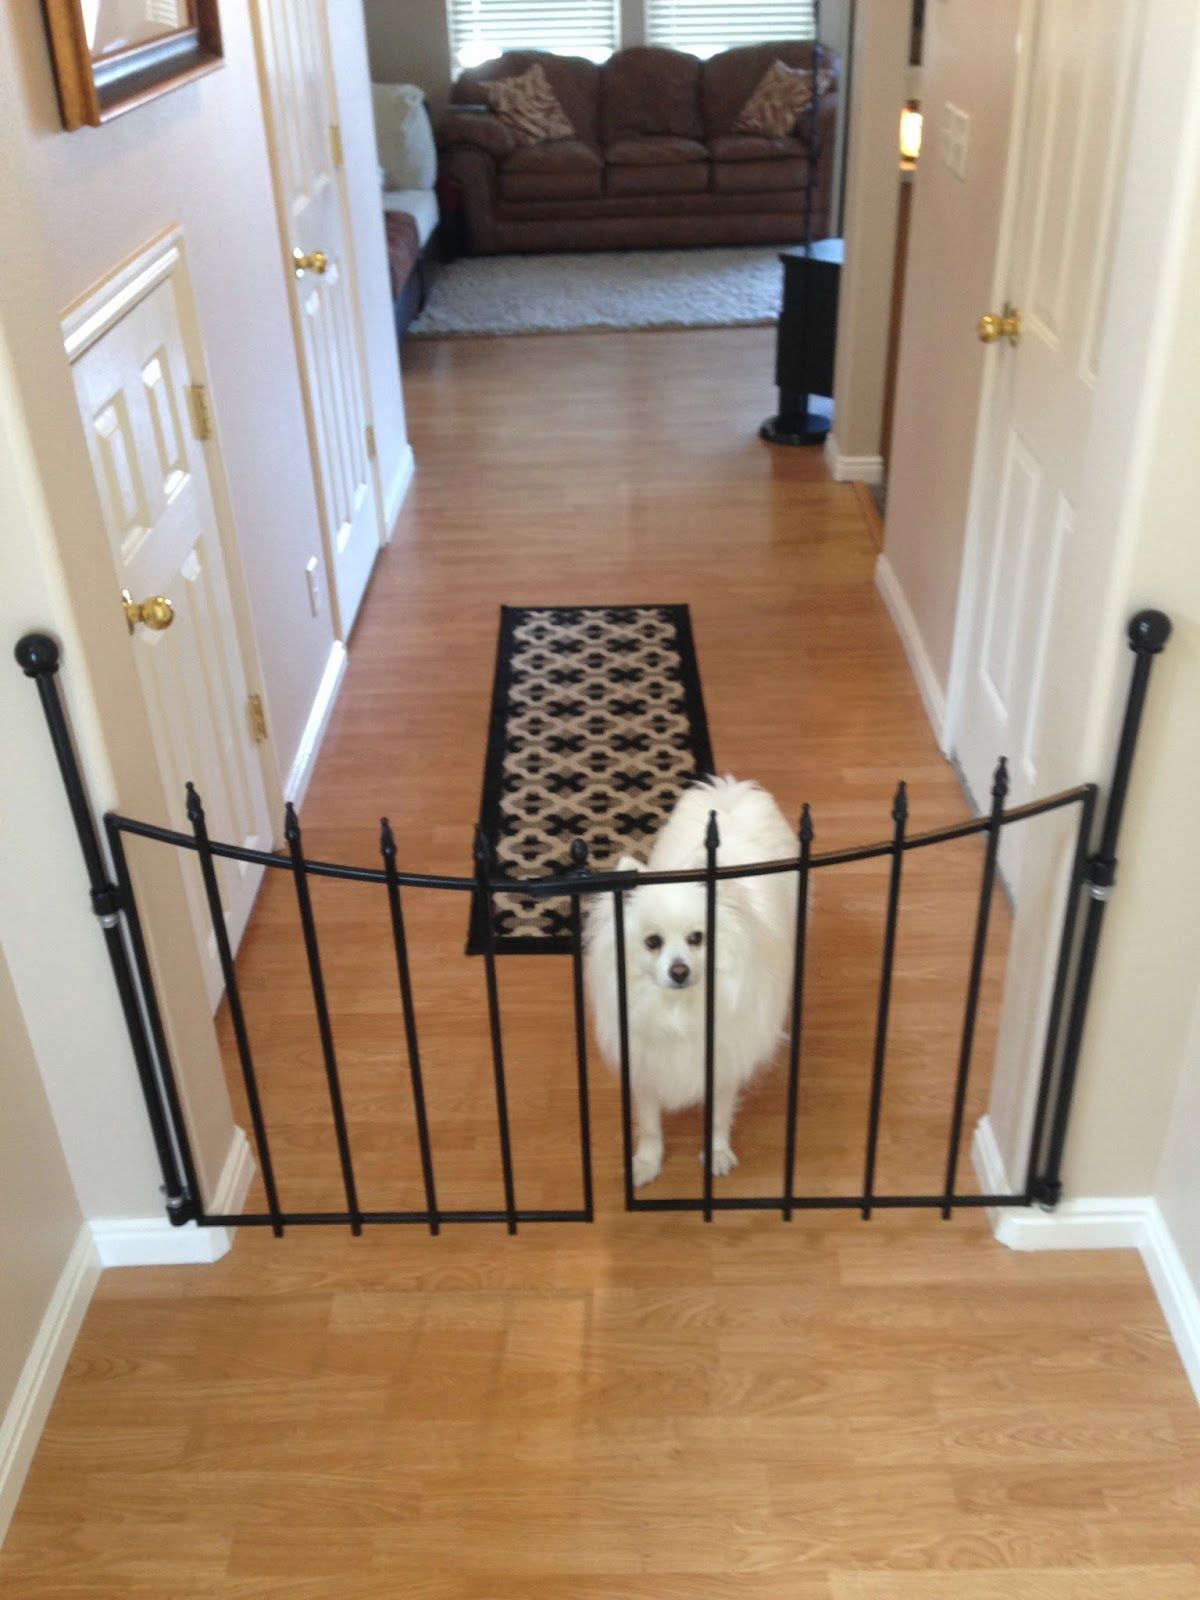 Diy Pet Gate For The Home Pet Gate Diy Dog Gate Pet